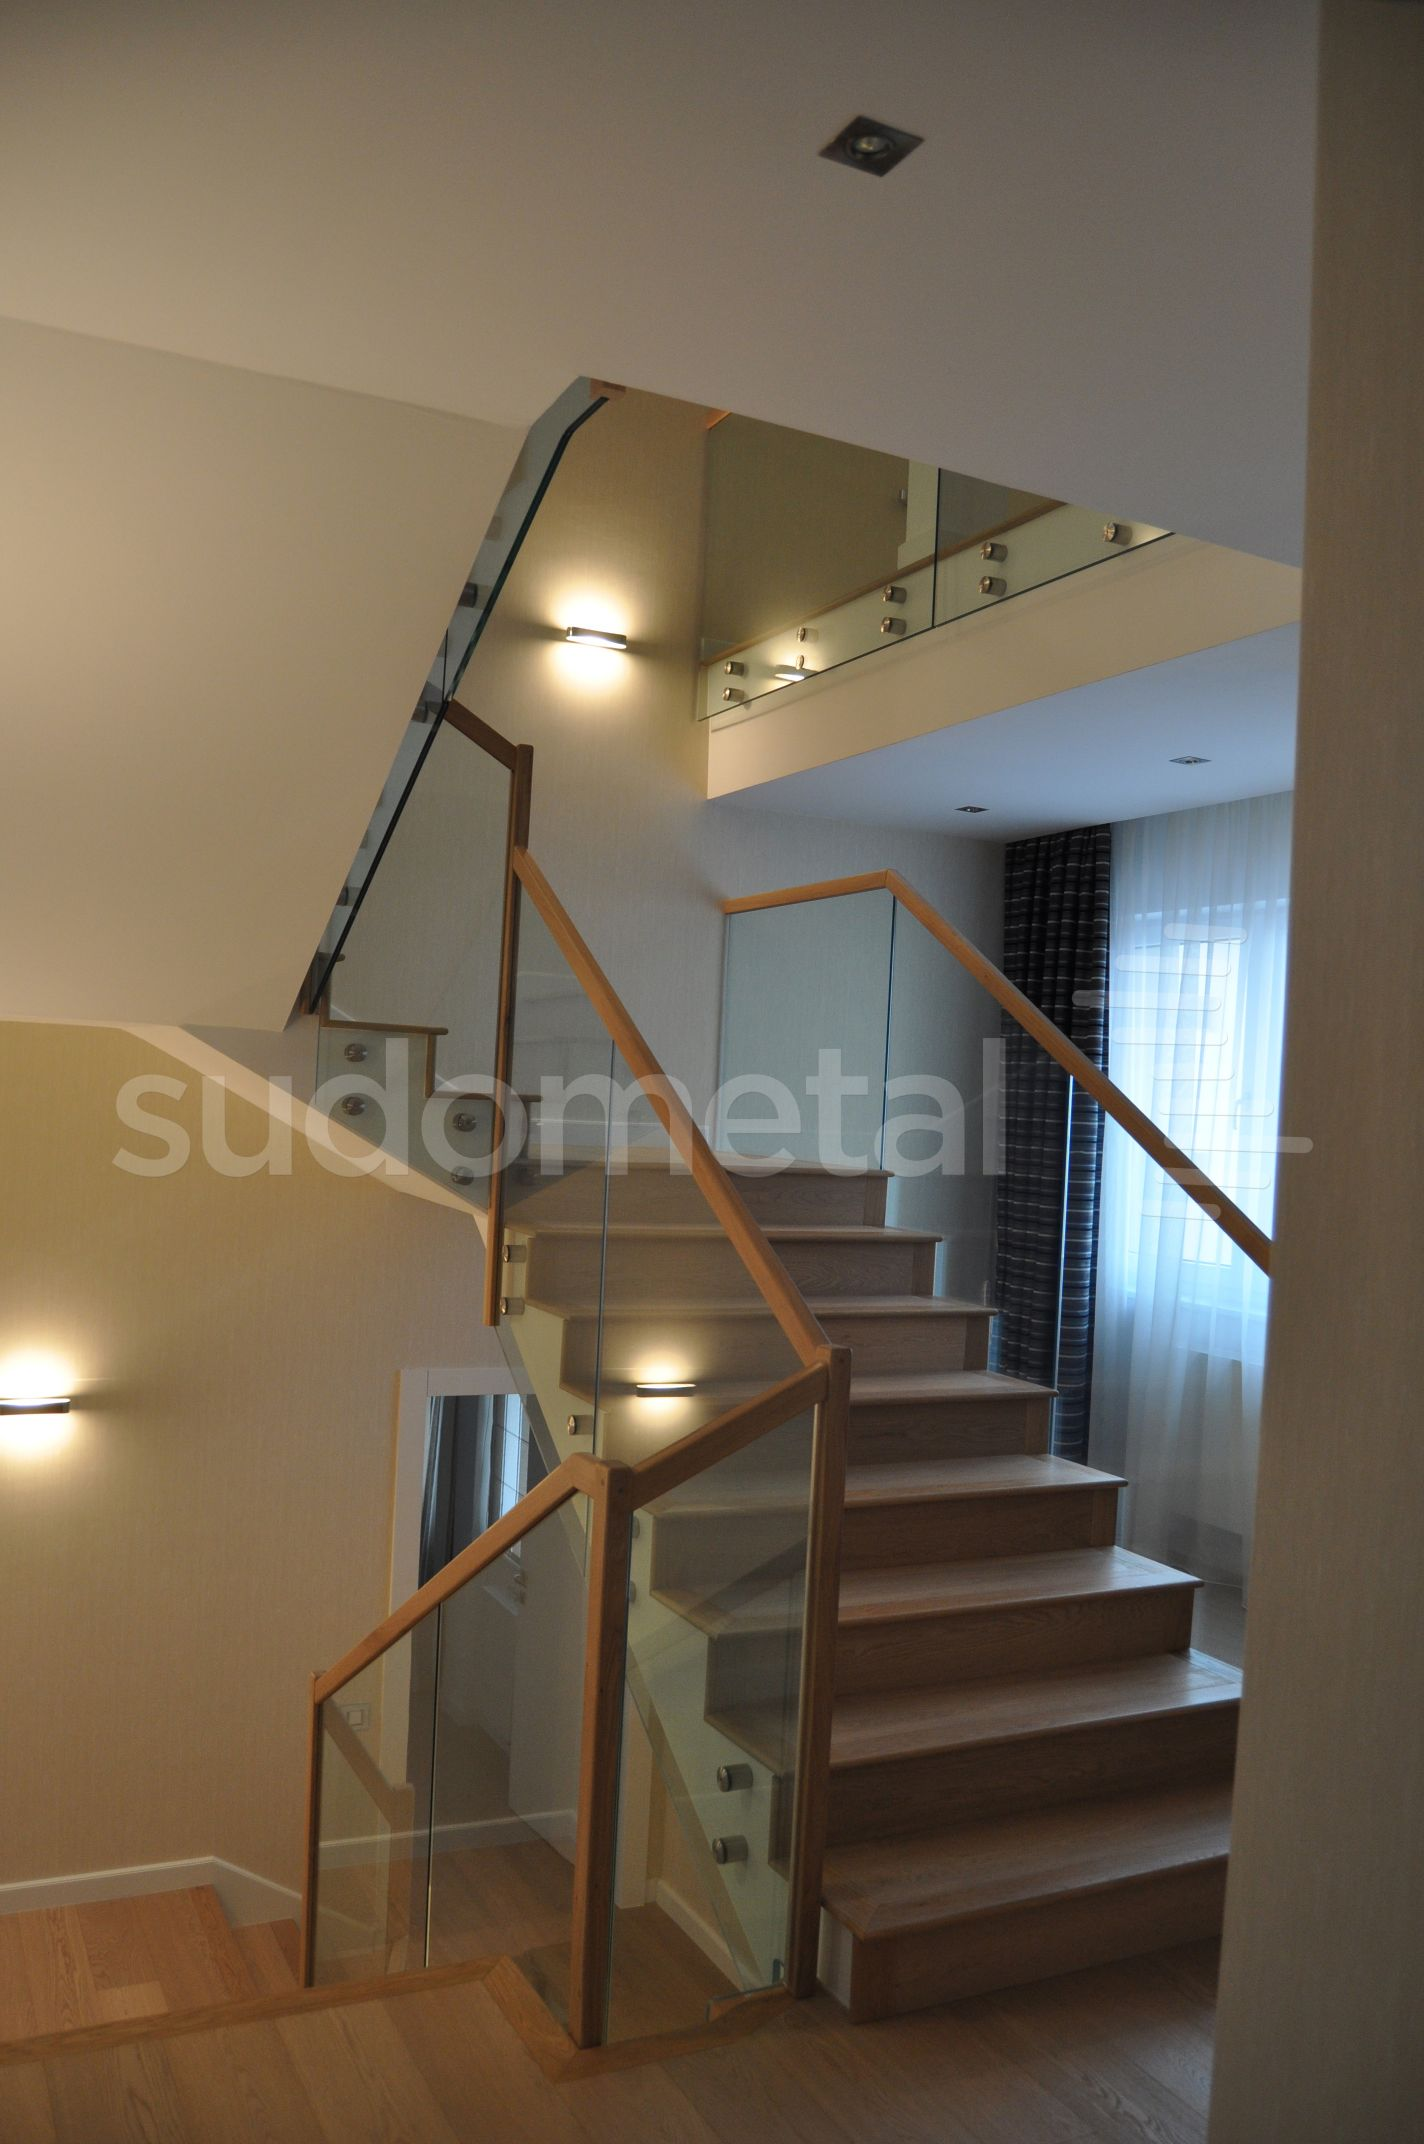 Balustrade din sticla - Balustrada casa particulara Otopeni SUDOMETAL - Poza 5